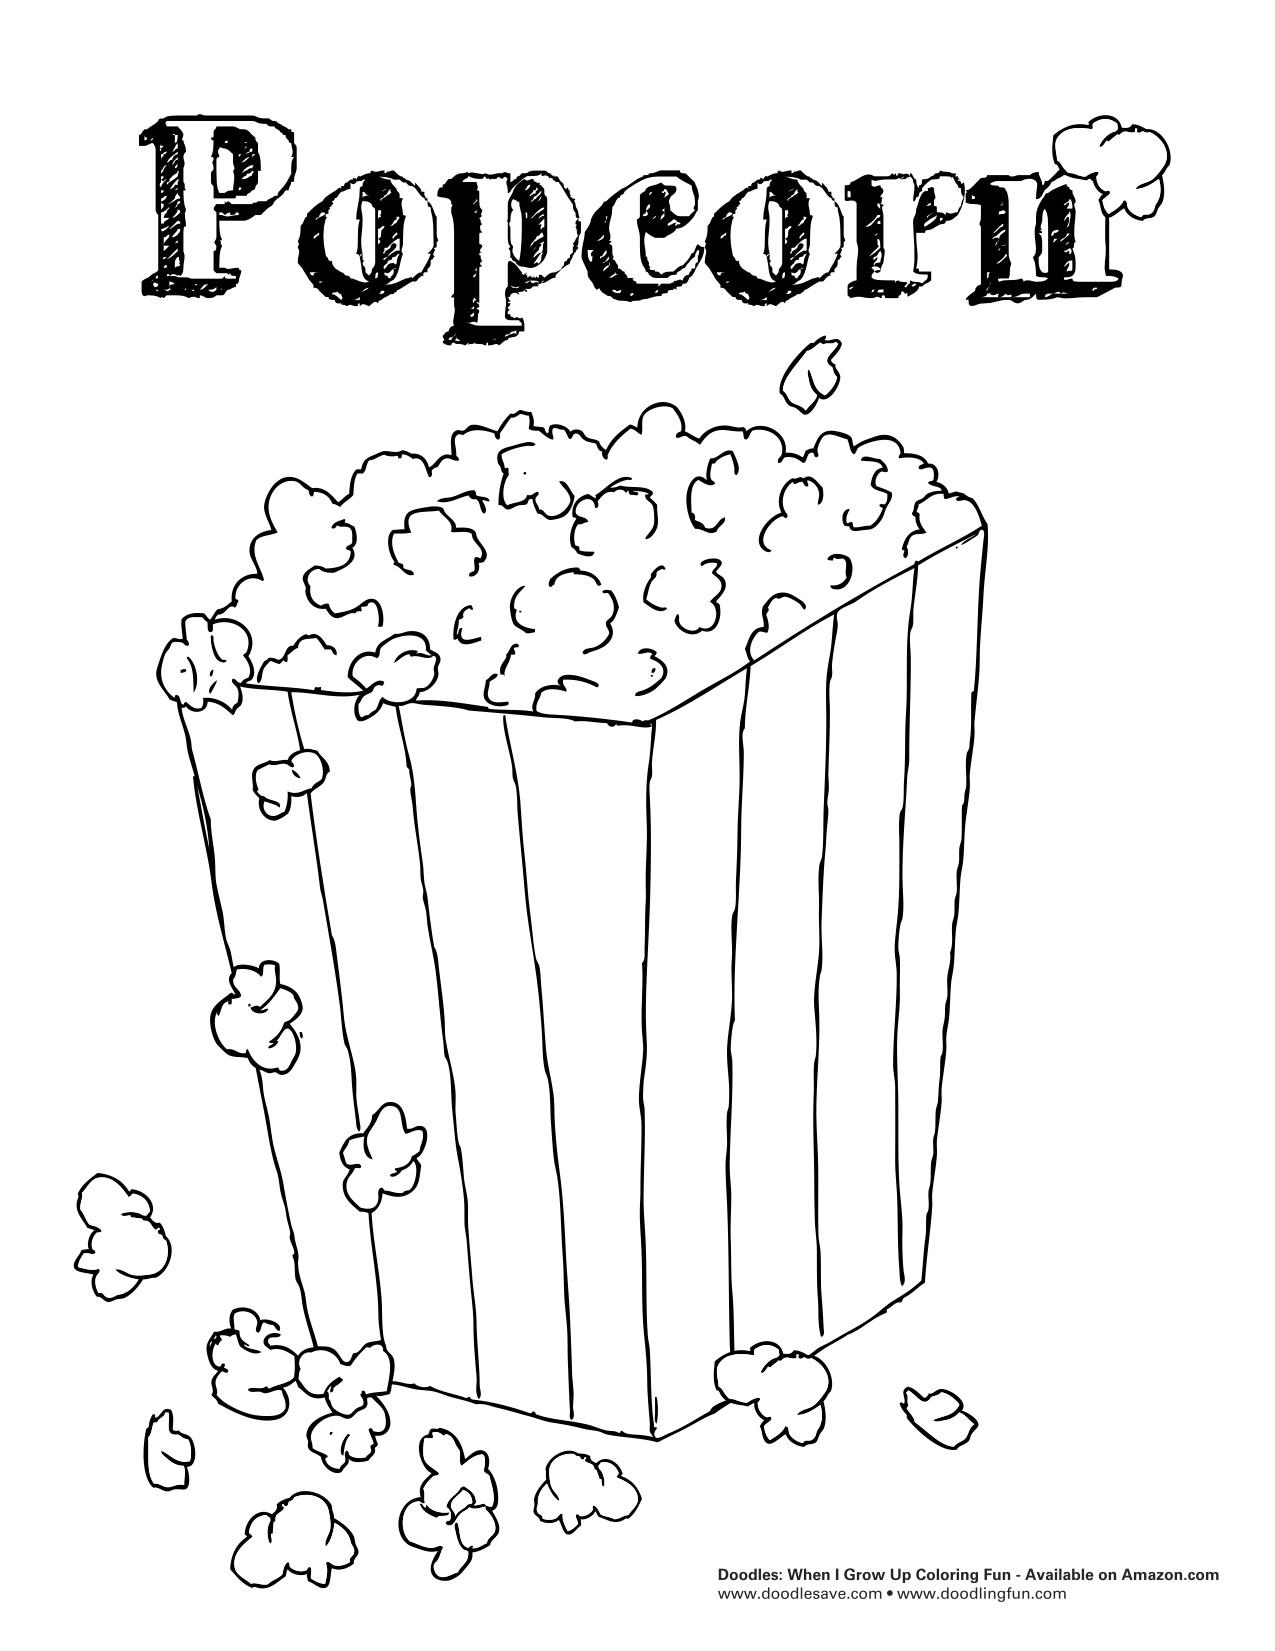 popcorn kernel coloring page - popcorn box coloring page sketch coloring page